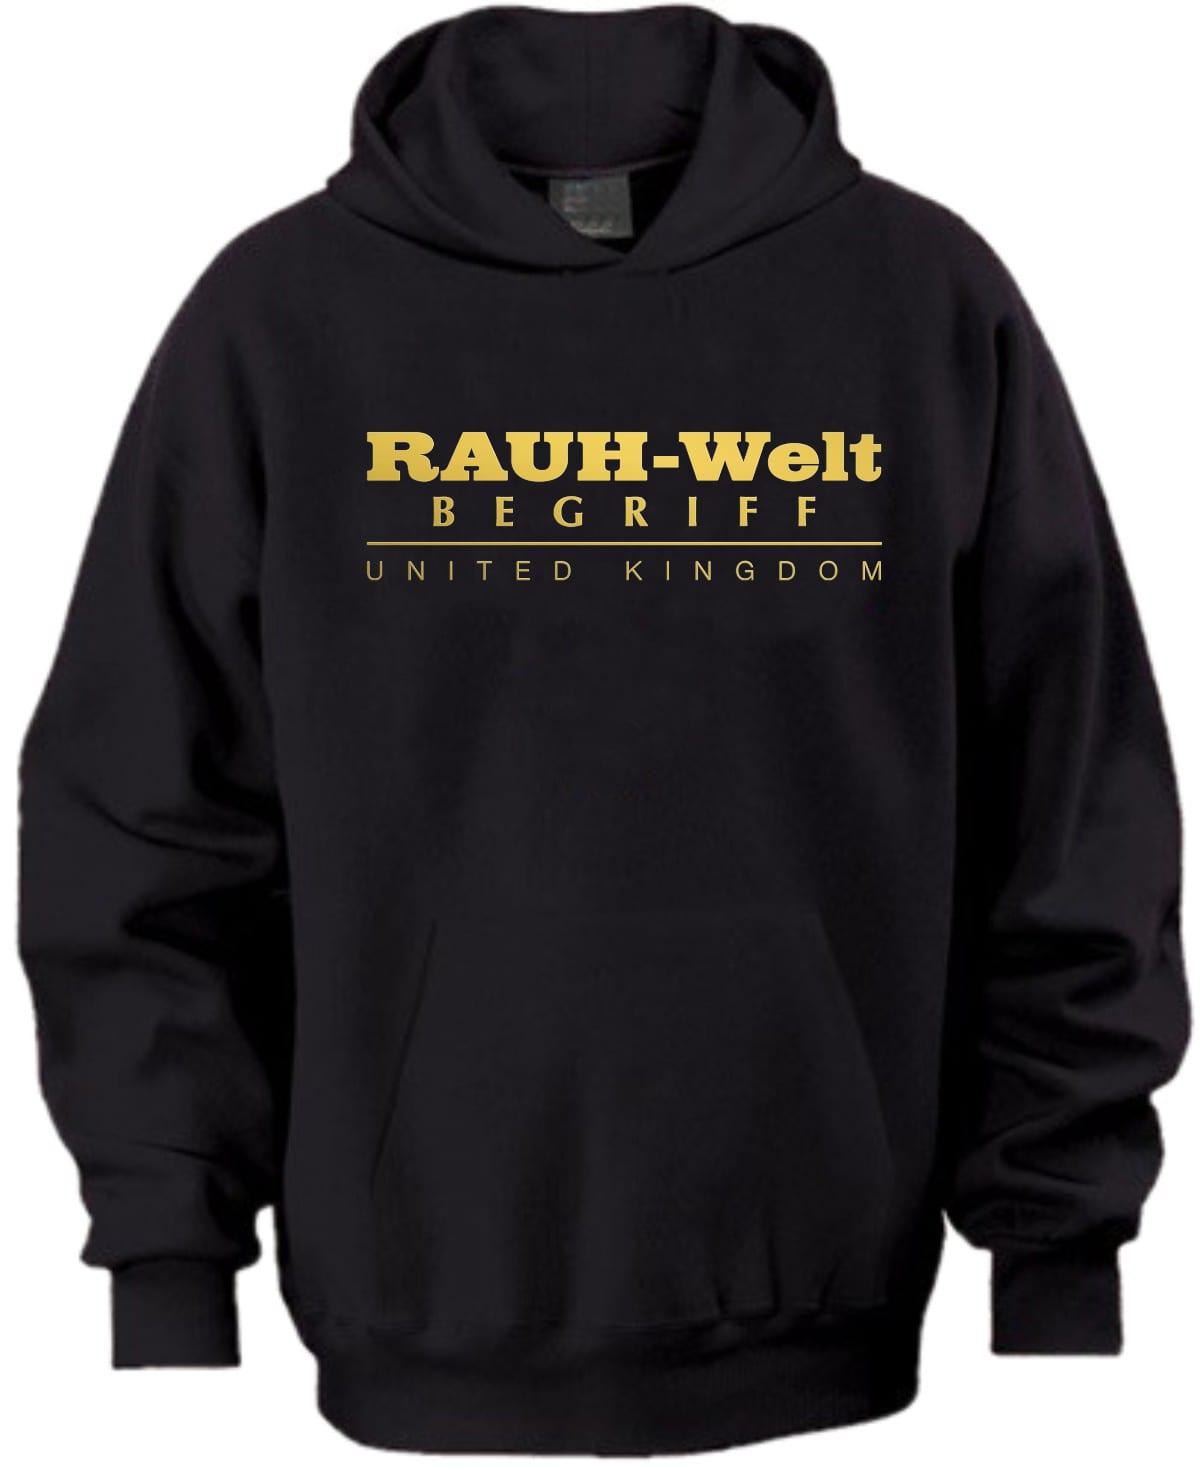 RWB UK Black Hoodie